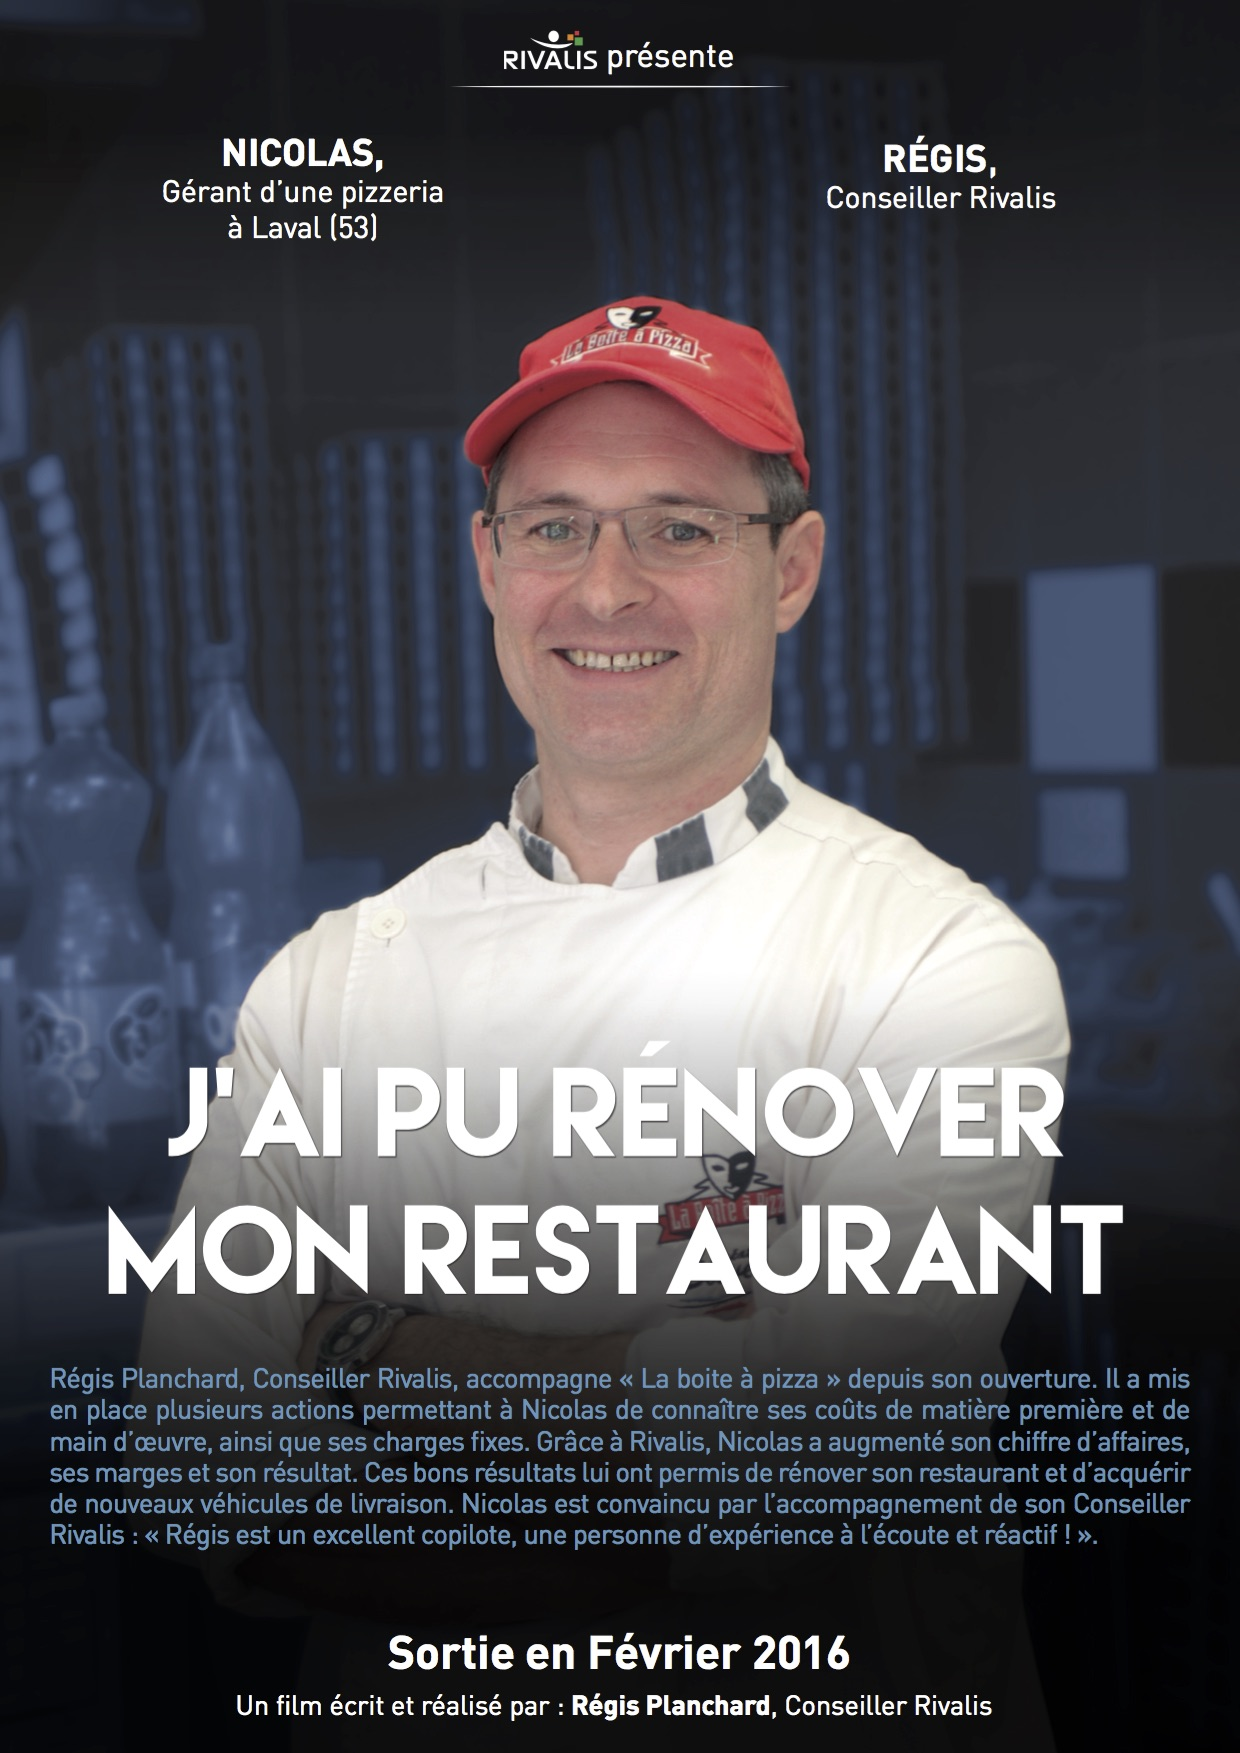 Nicolas, gérant pizzeria (53)